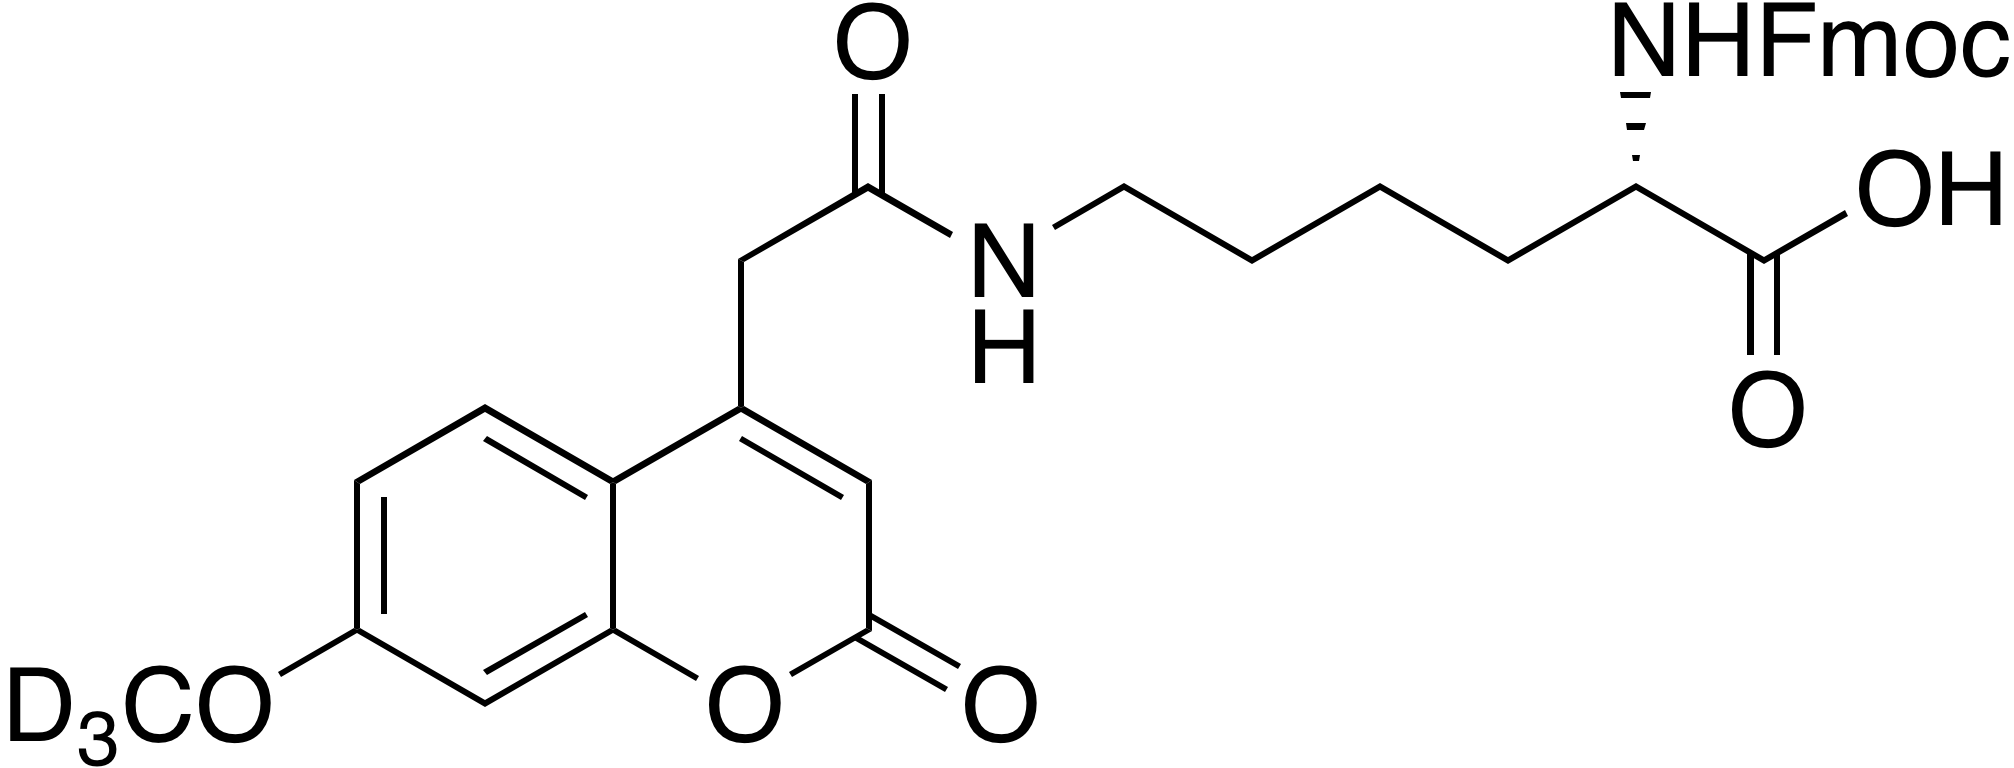 Fmoc-Lys(Mca-d<sub>3</sub>)-OH